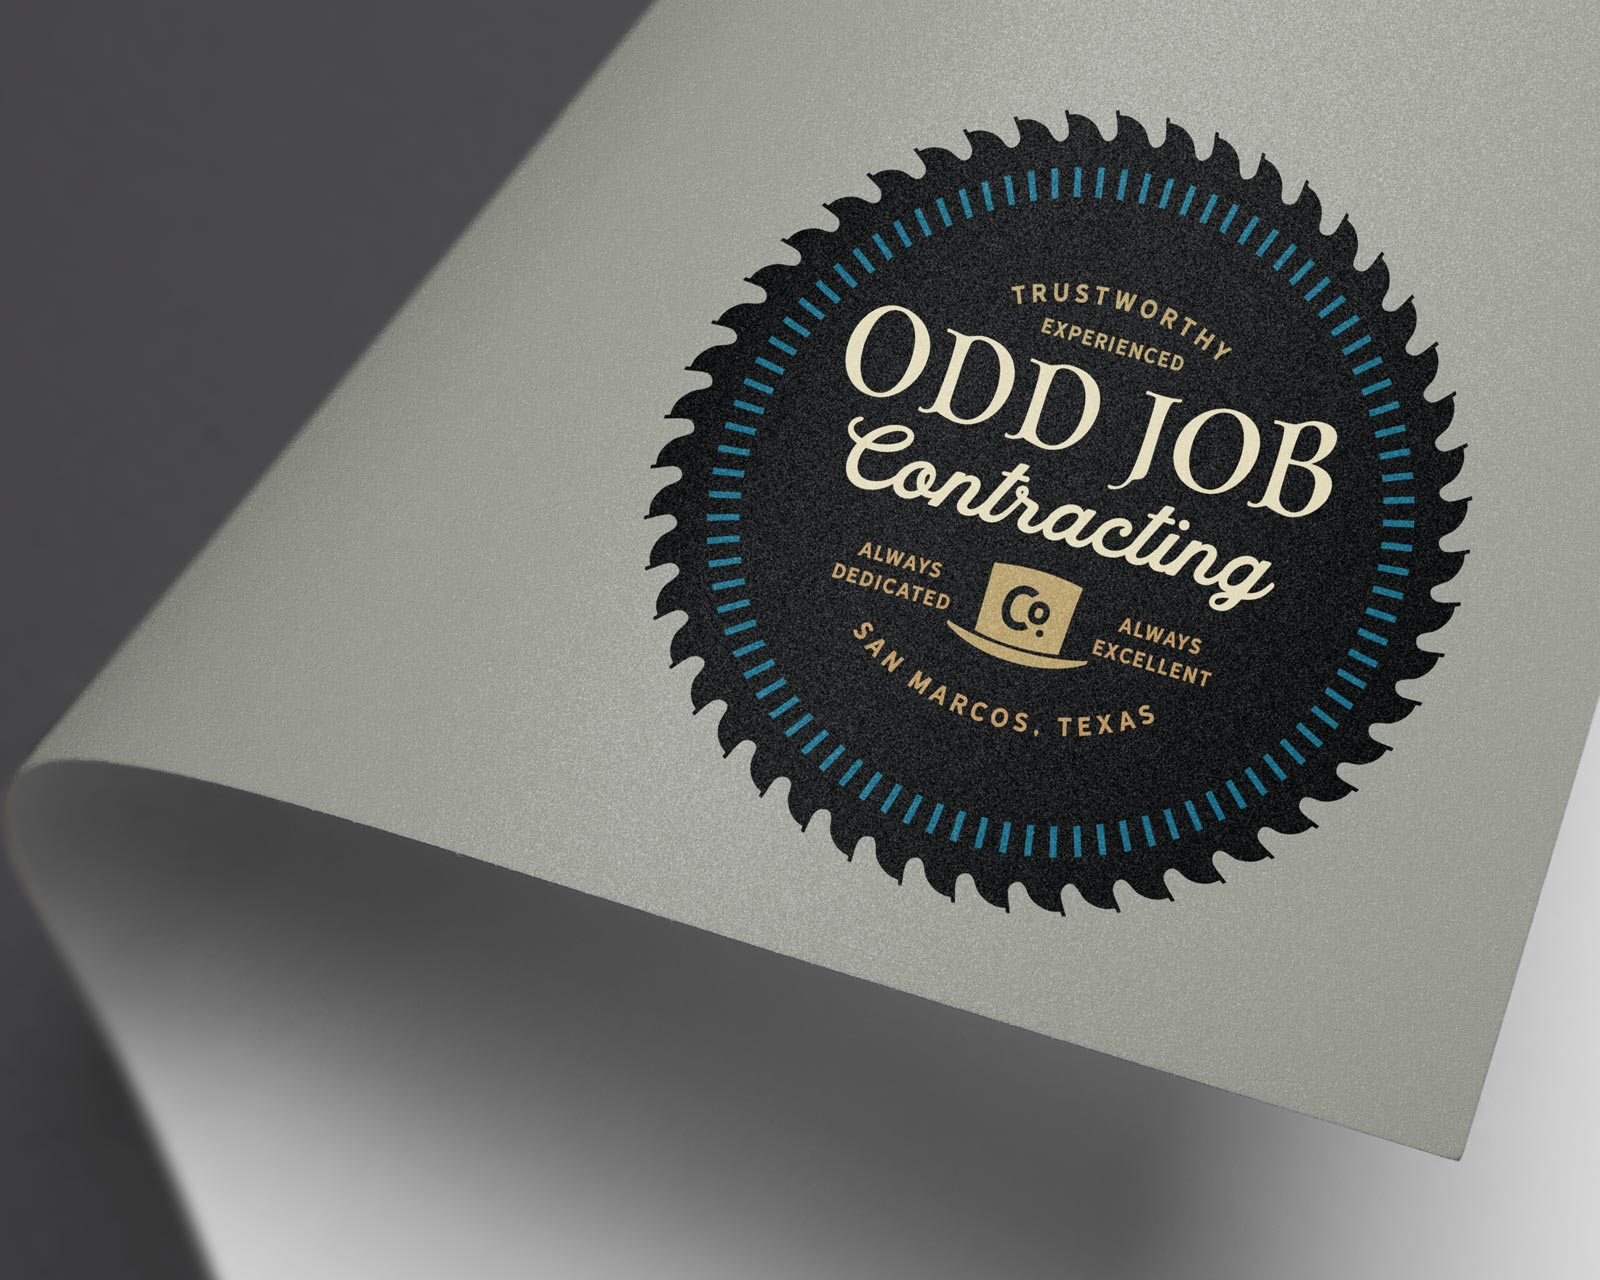 OddJobb-logo-design